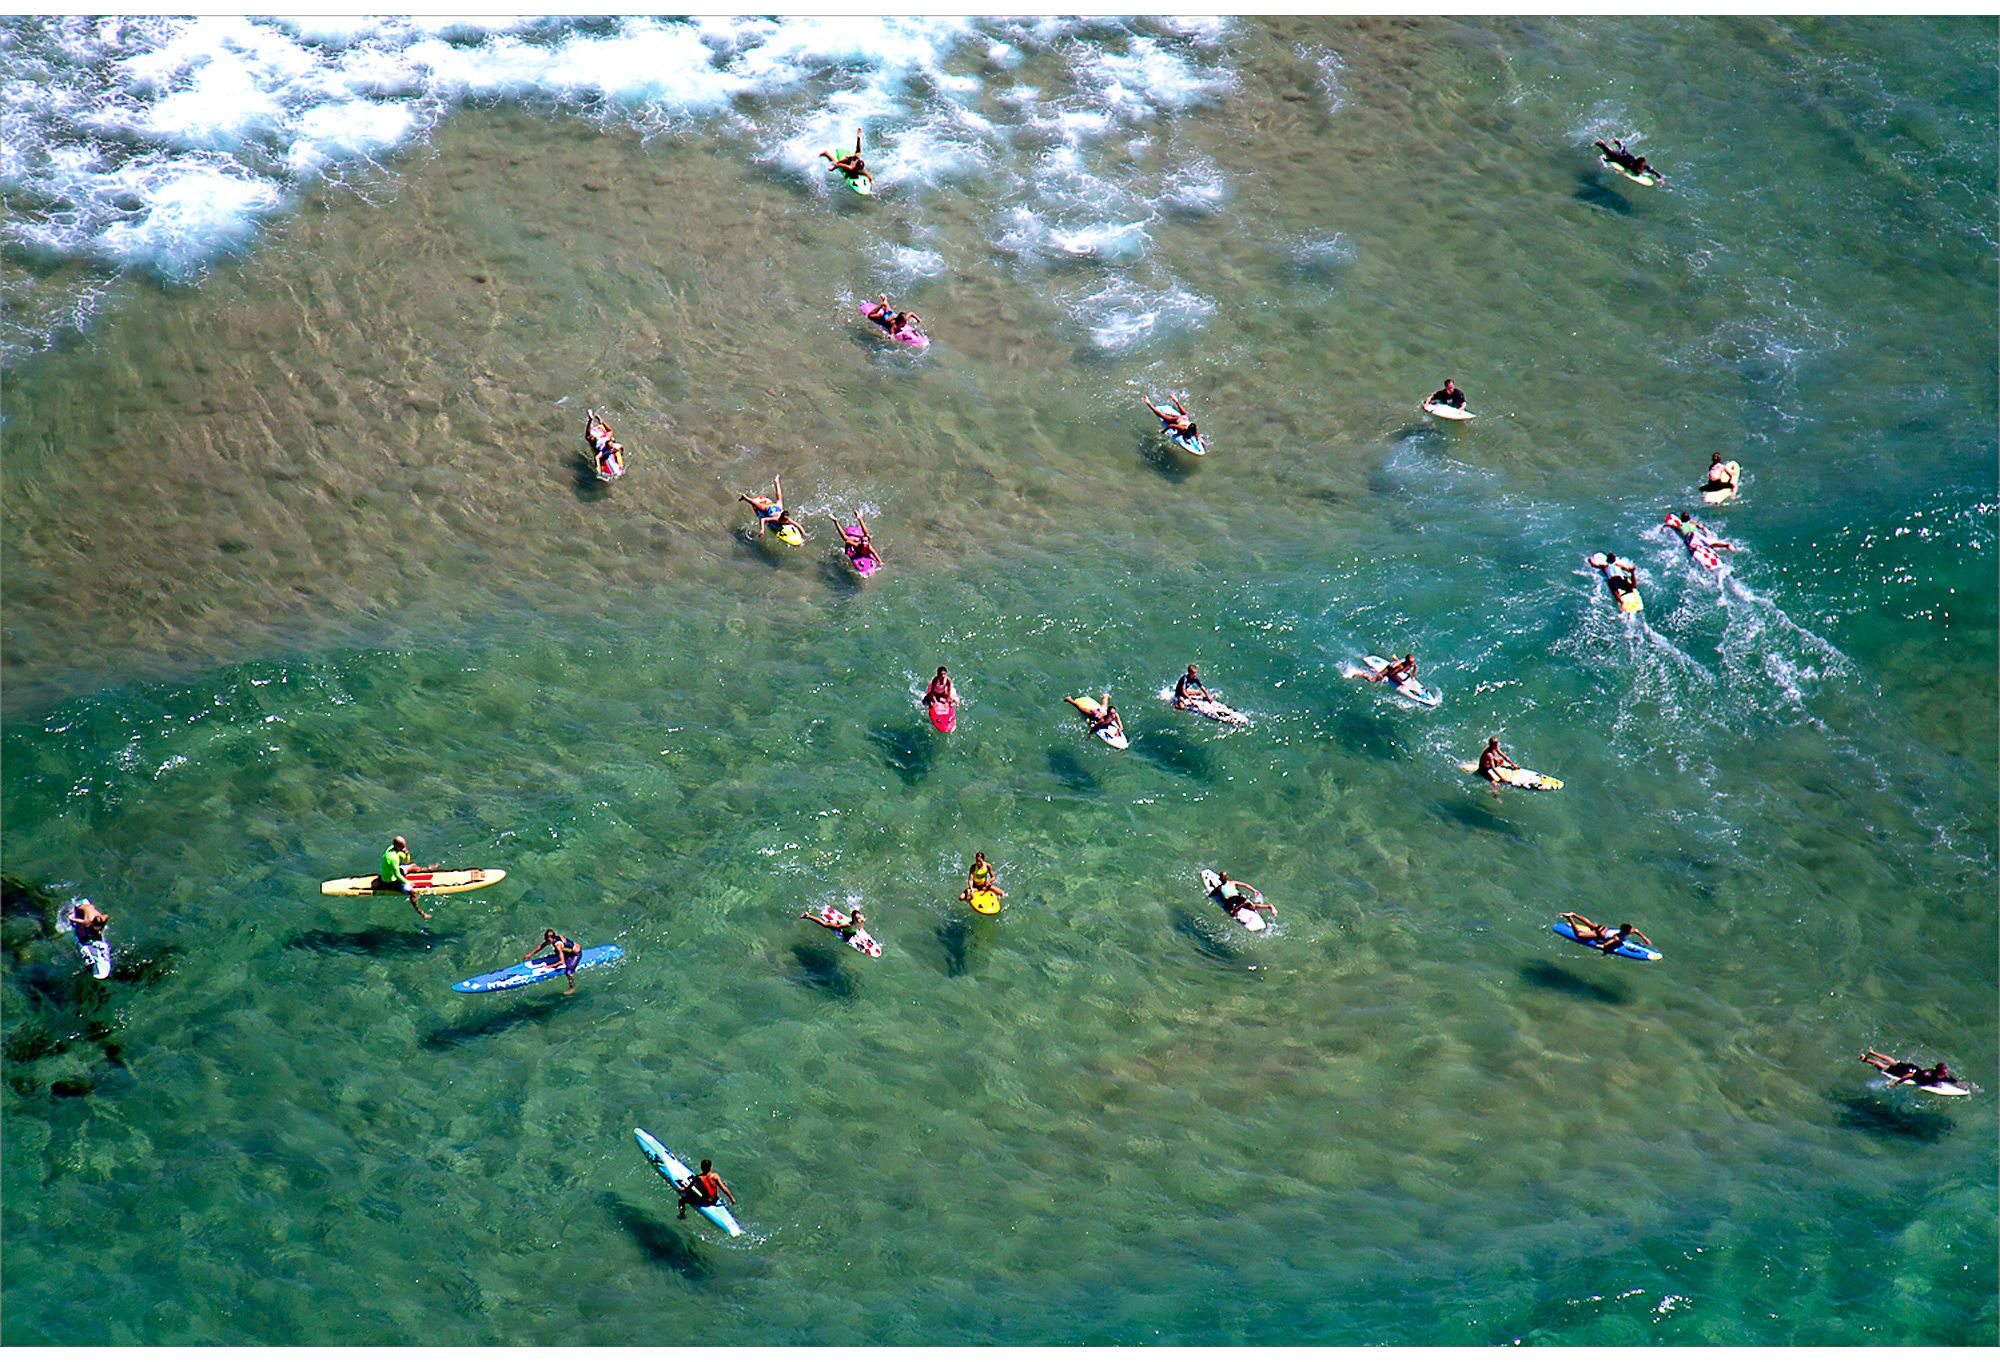 Maroubra Beach Surfers, Sydney